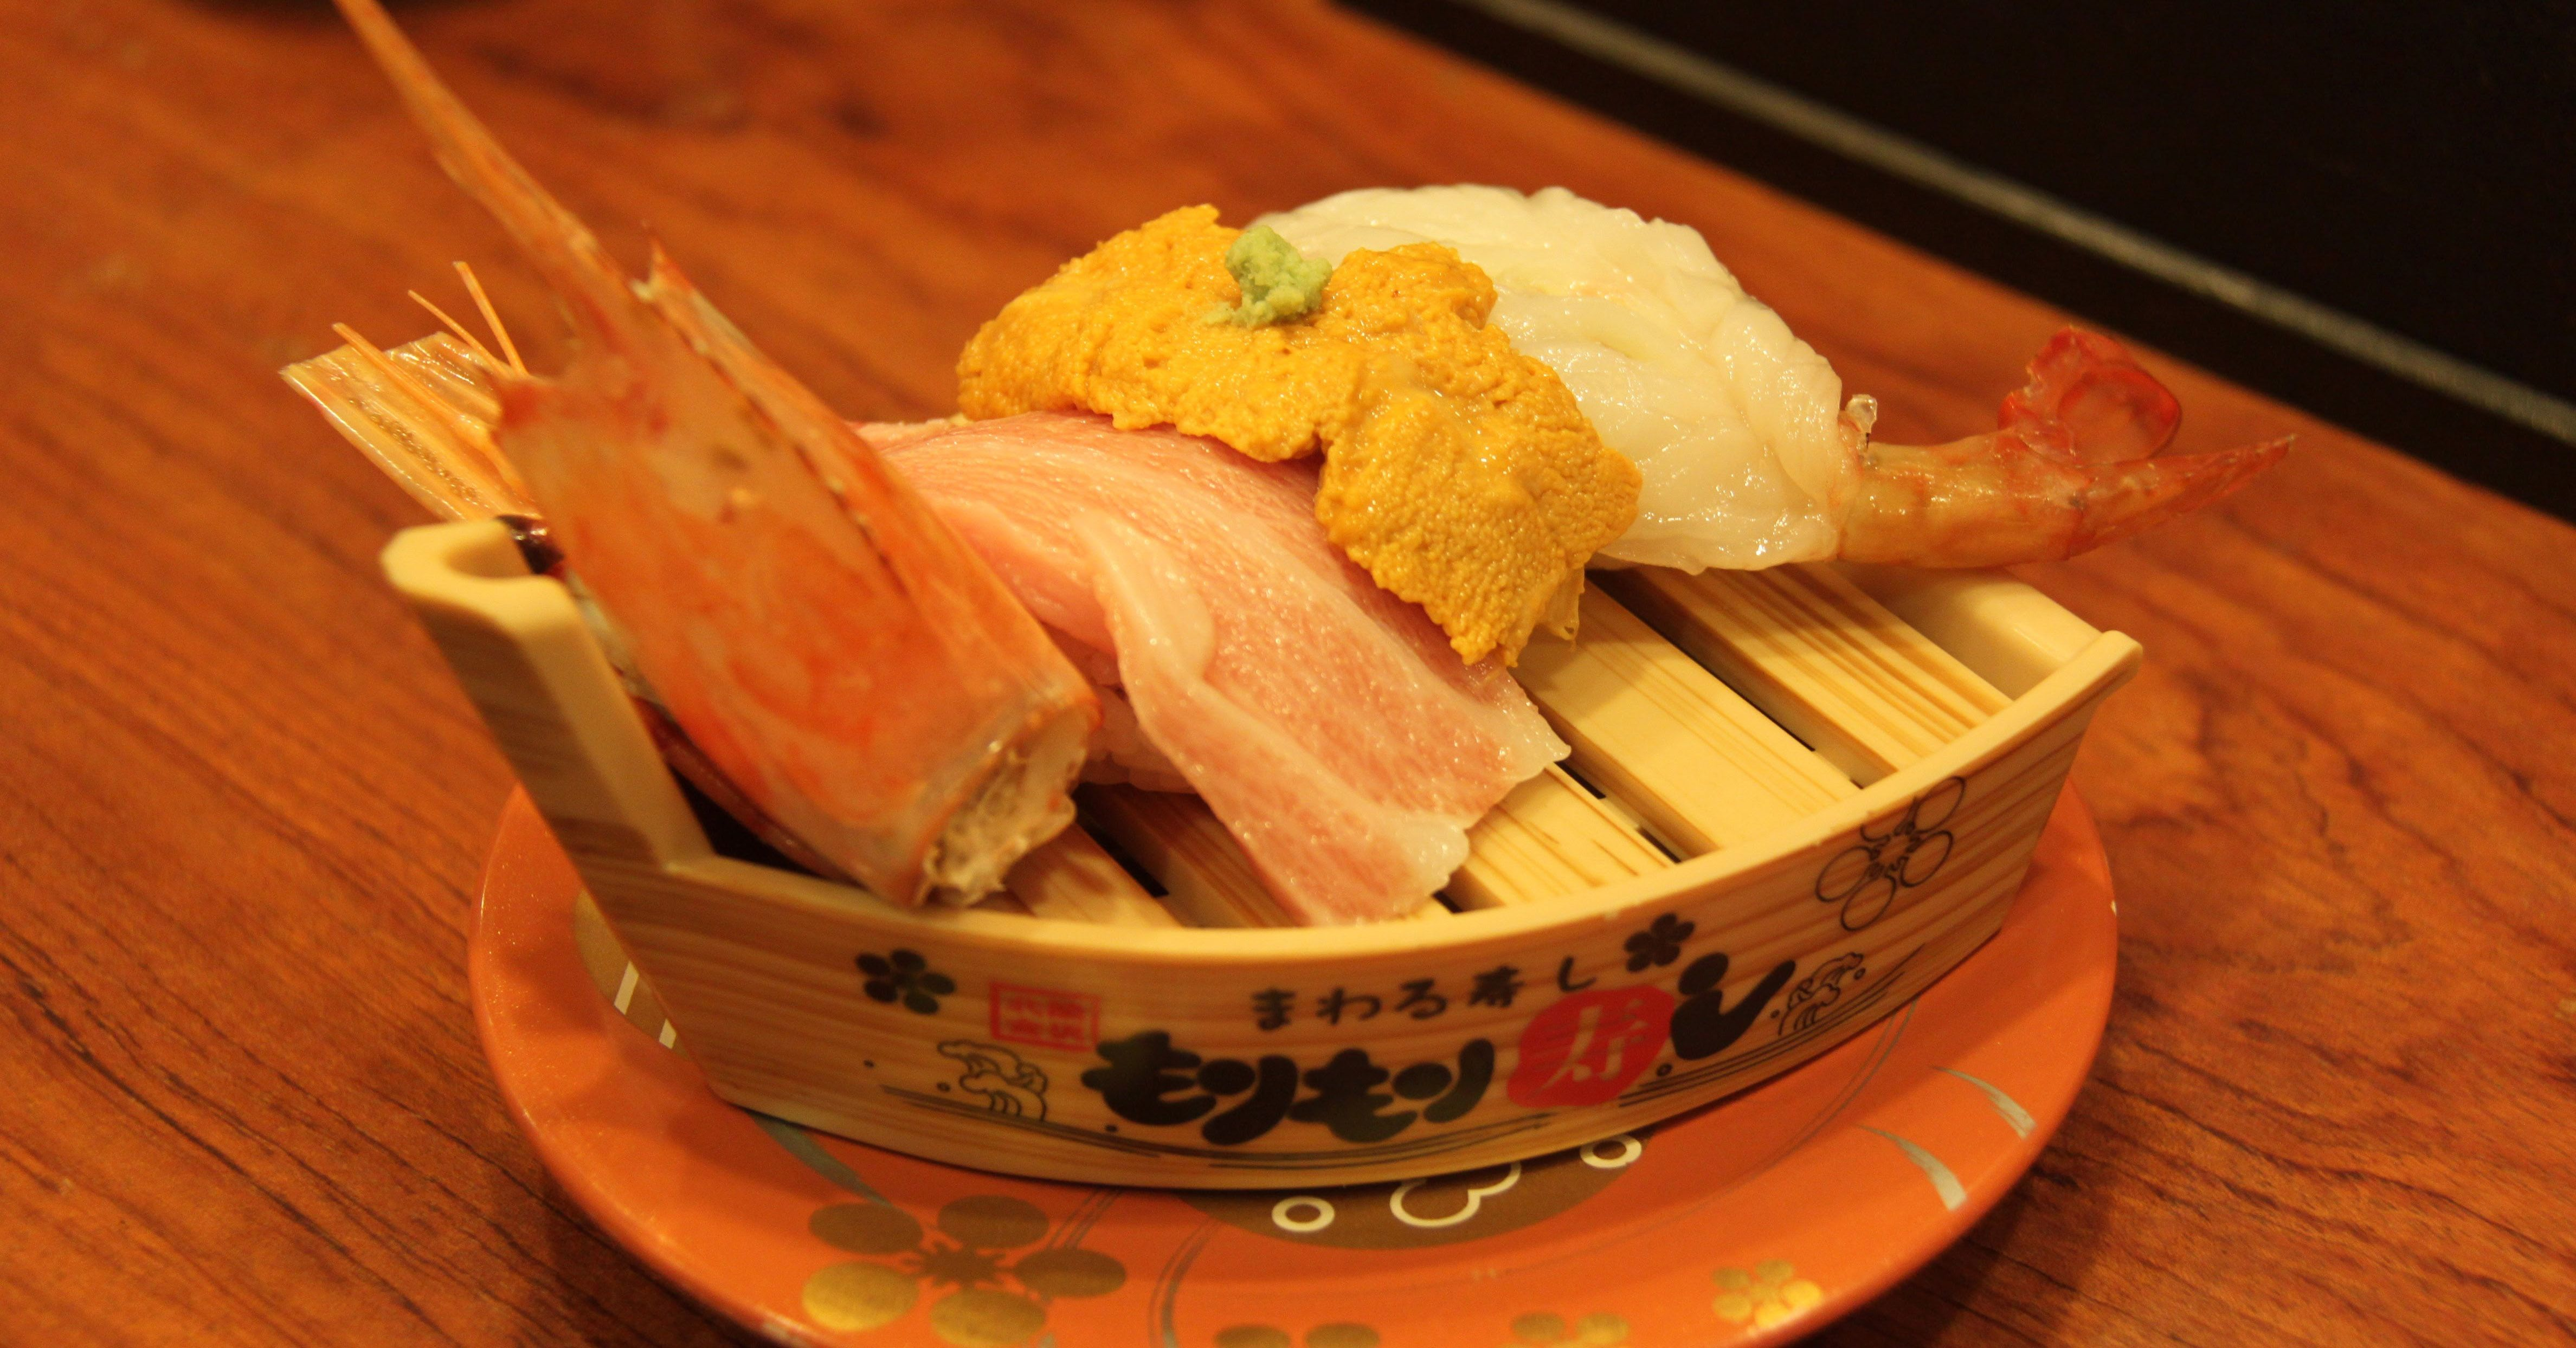 金澤-近江町市場 の 壽司下午茶 (日本–名古屋,岐阜及北陸之旅)   Gifu, Nagoya, Takayama